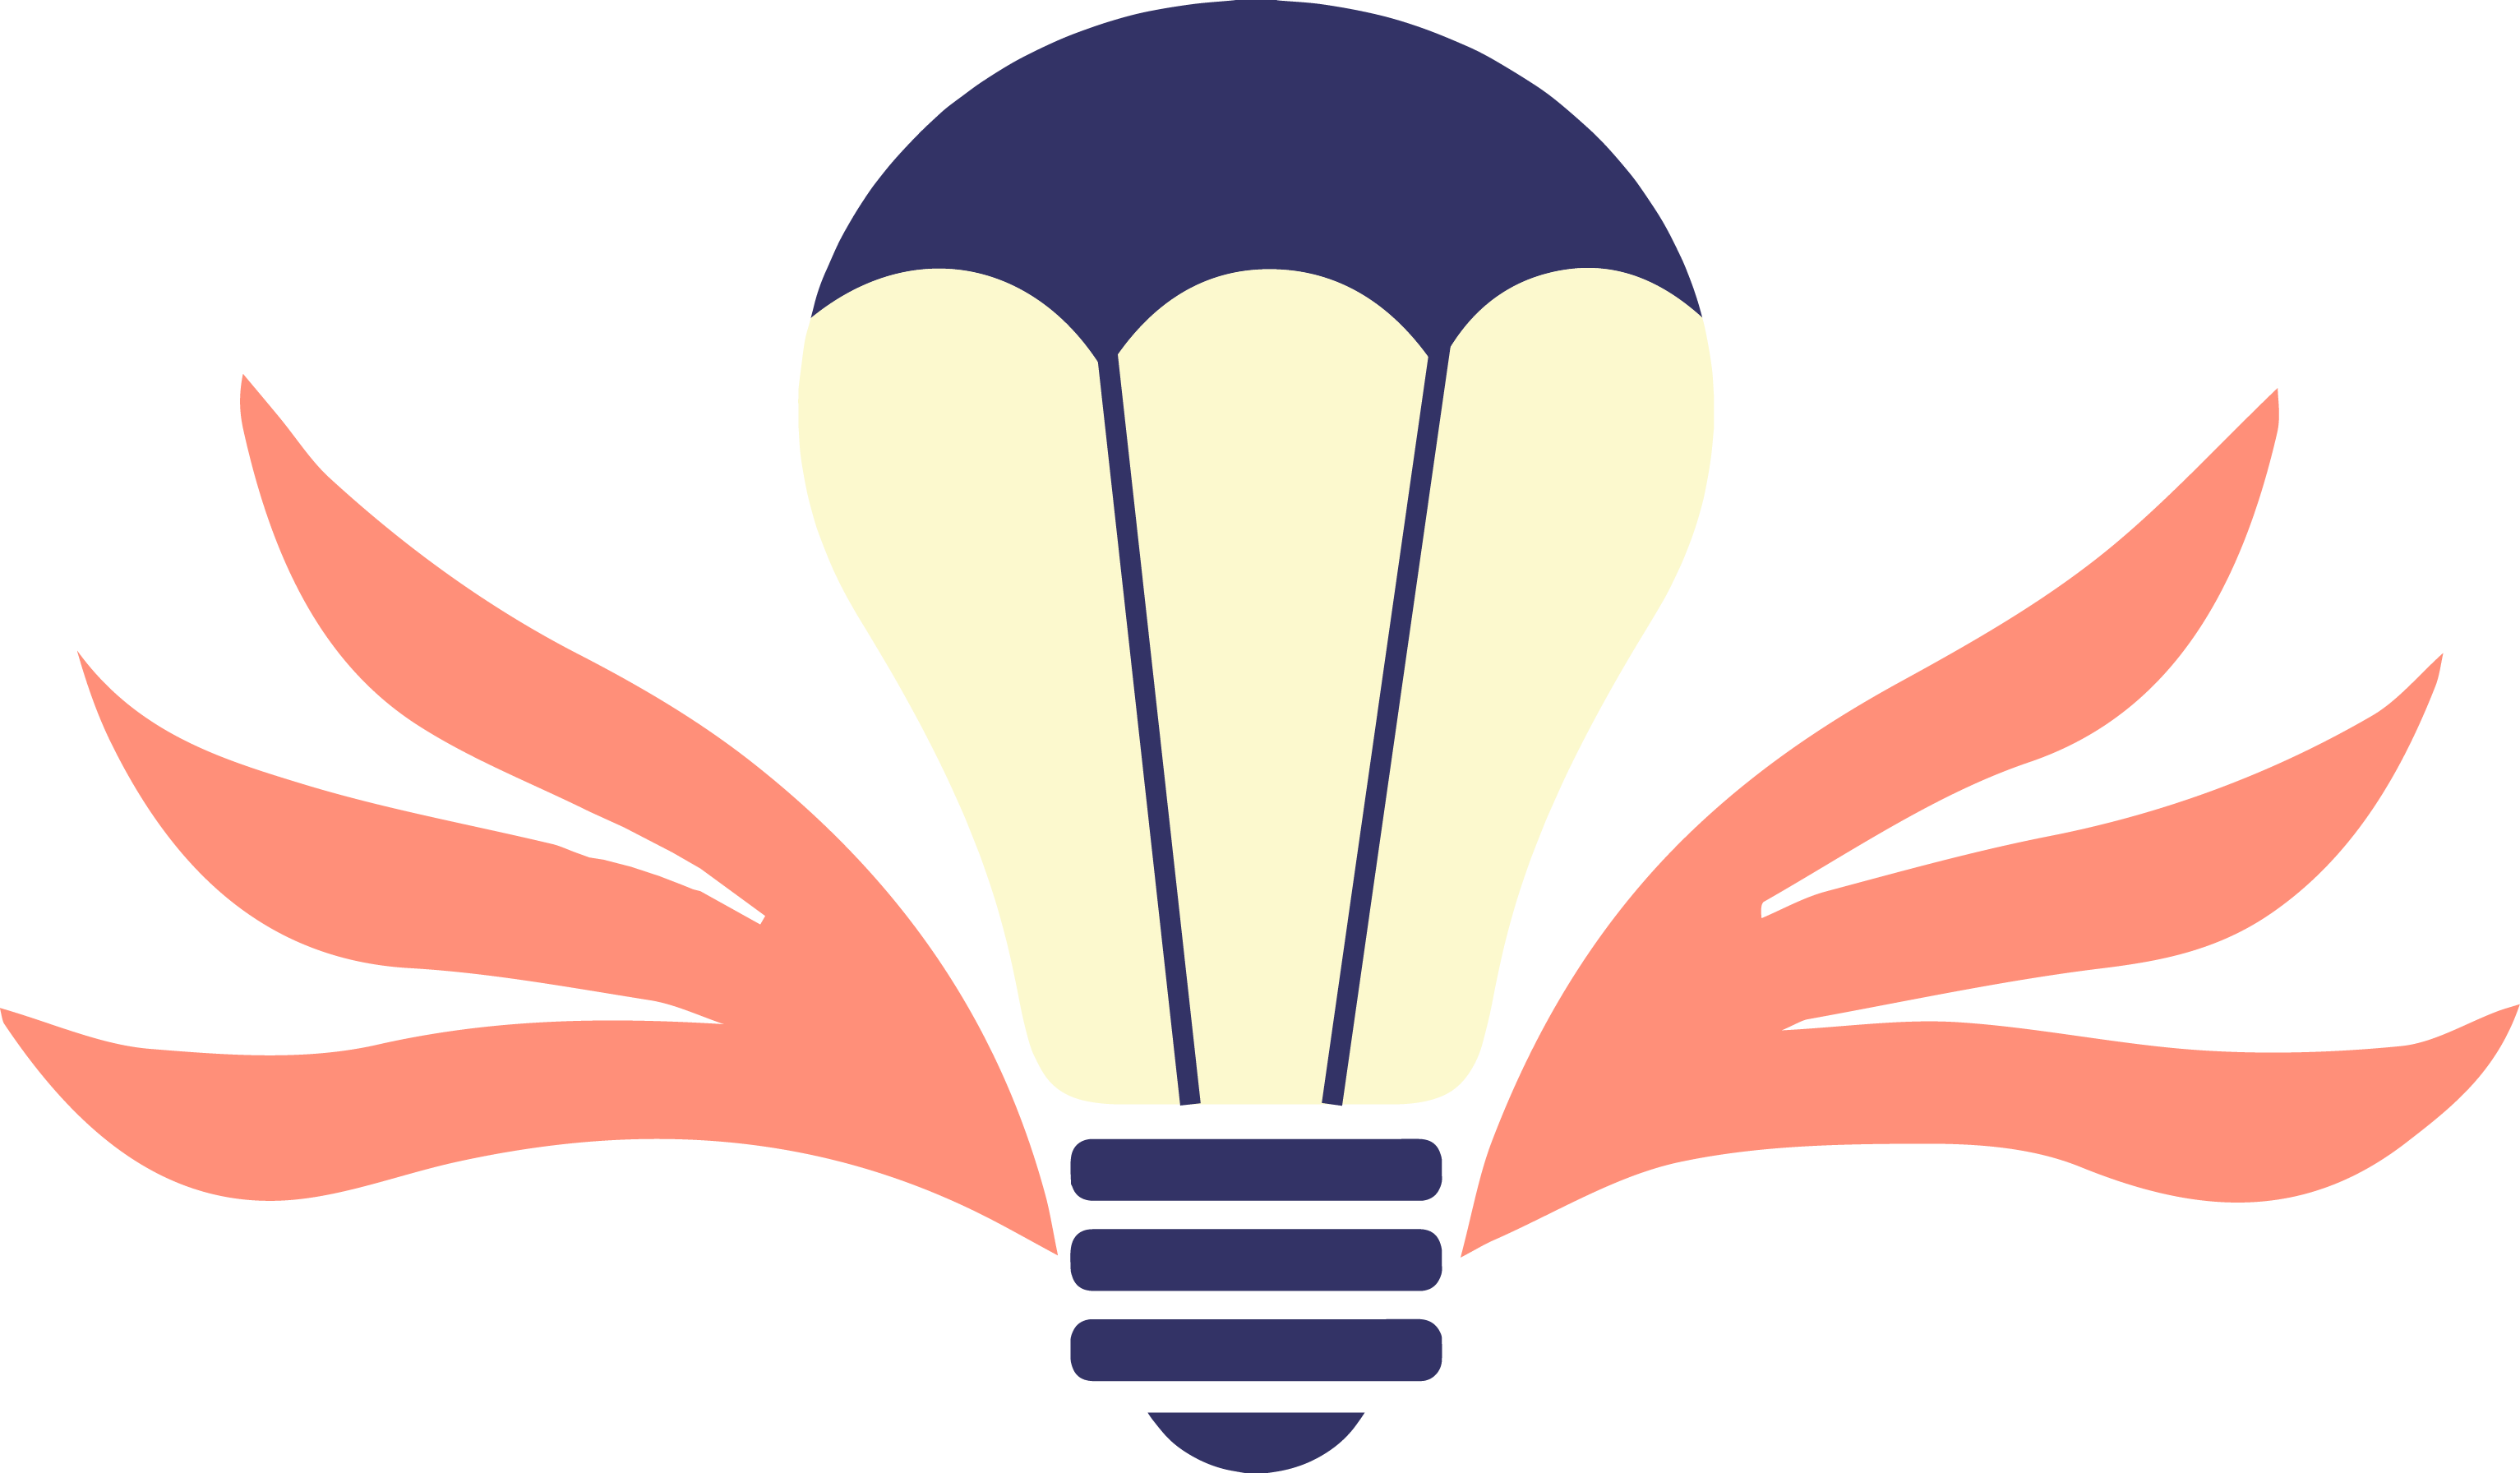 Mind Parachutes logo